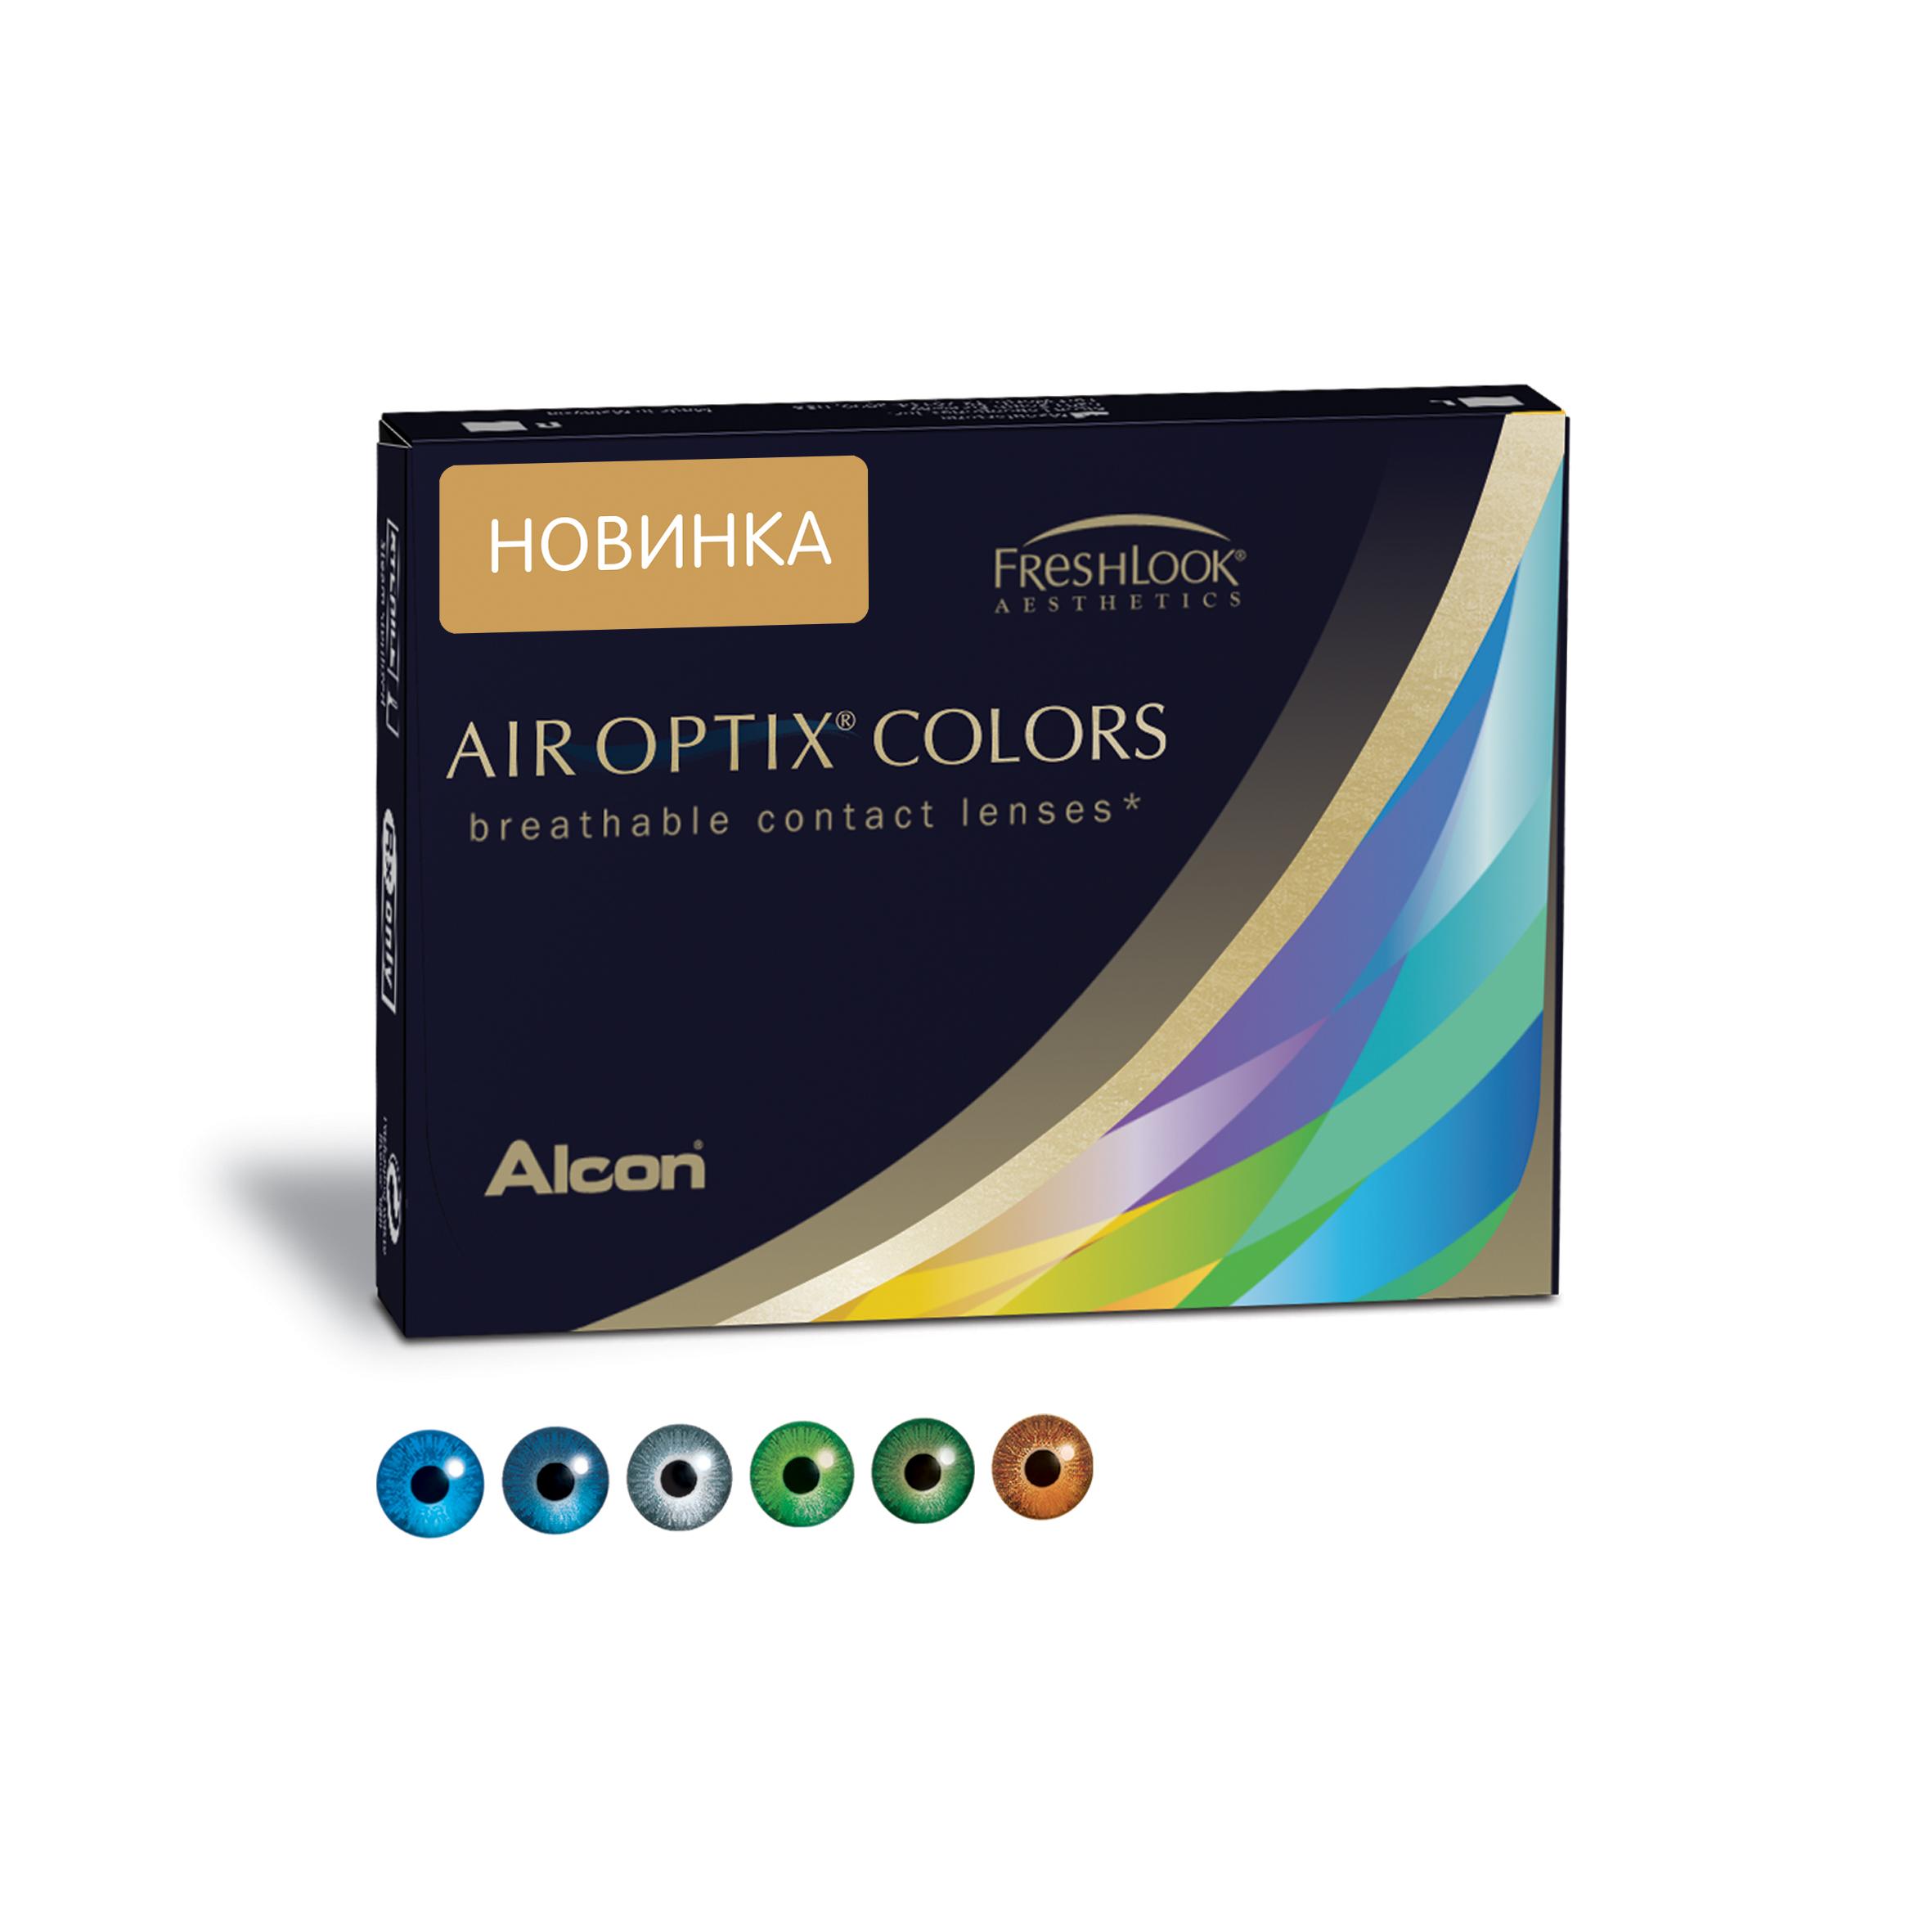 Аlcon контактные линзы Air Optix Colors 2 шт -0.75 Blue ( 31746112 )